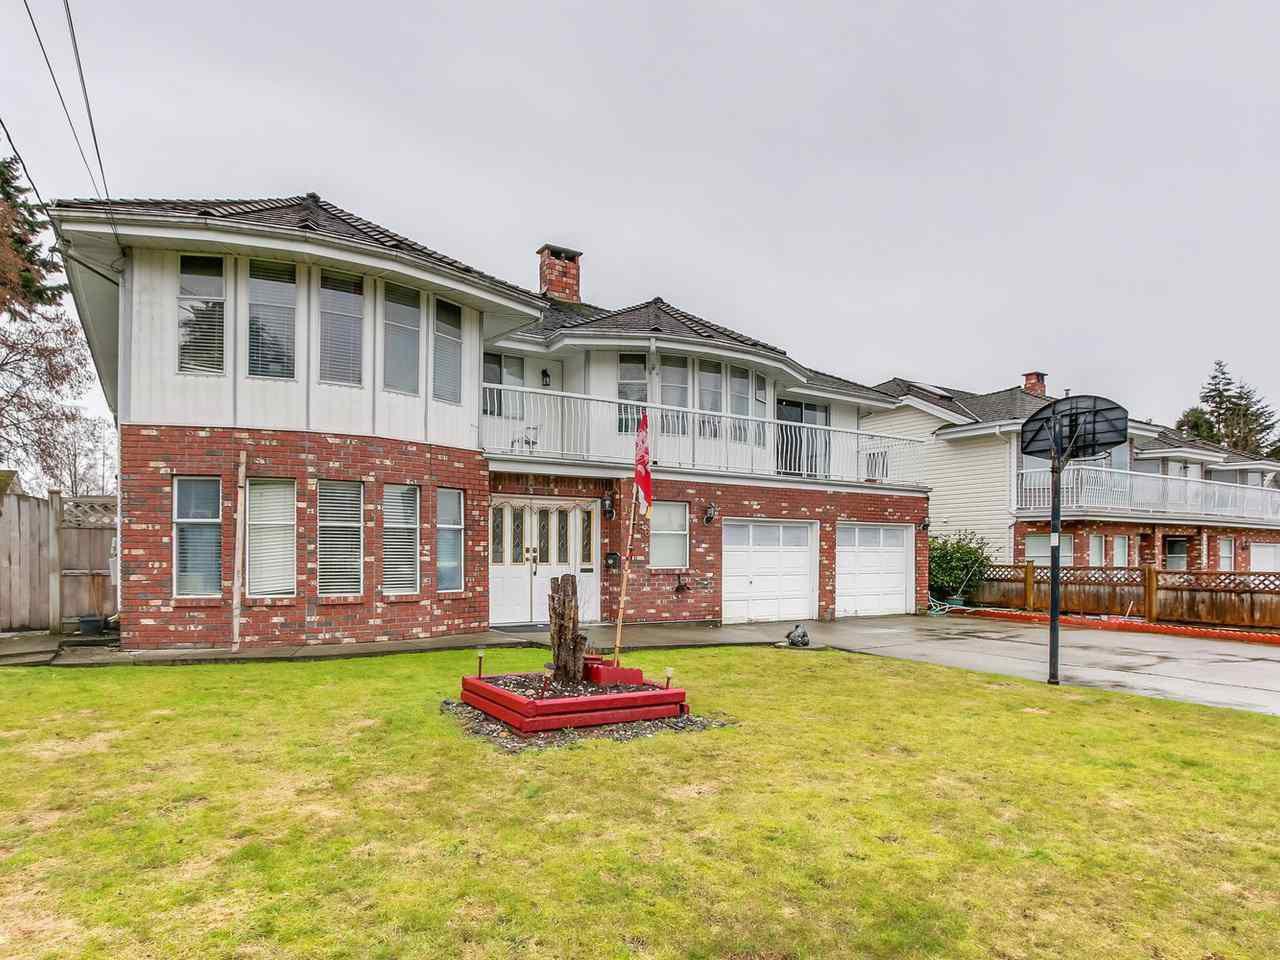 Main Photo: 12186 97A Avenue in Surrey: Cedar Hills House for sale (North Surrey)  : MLS®# R2145840